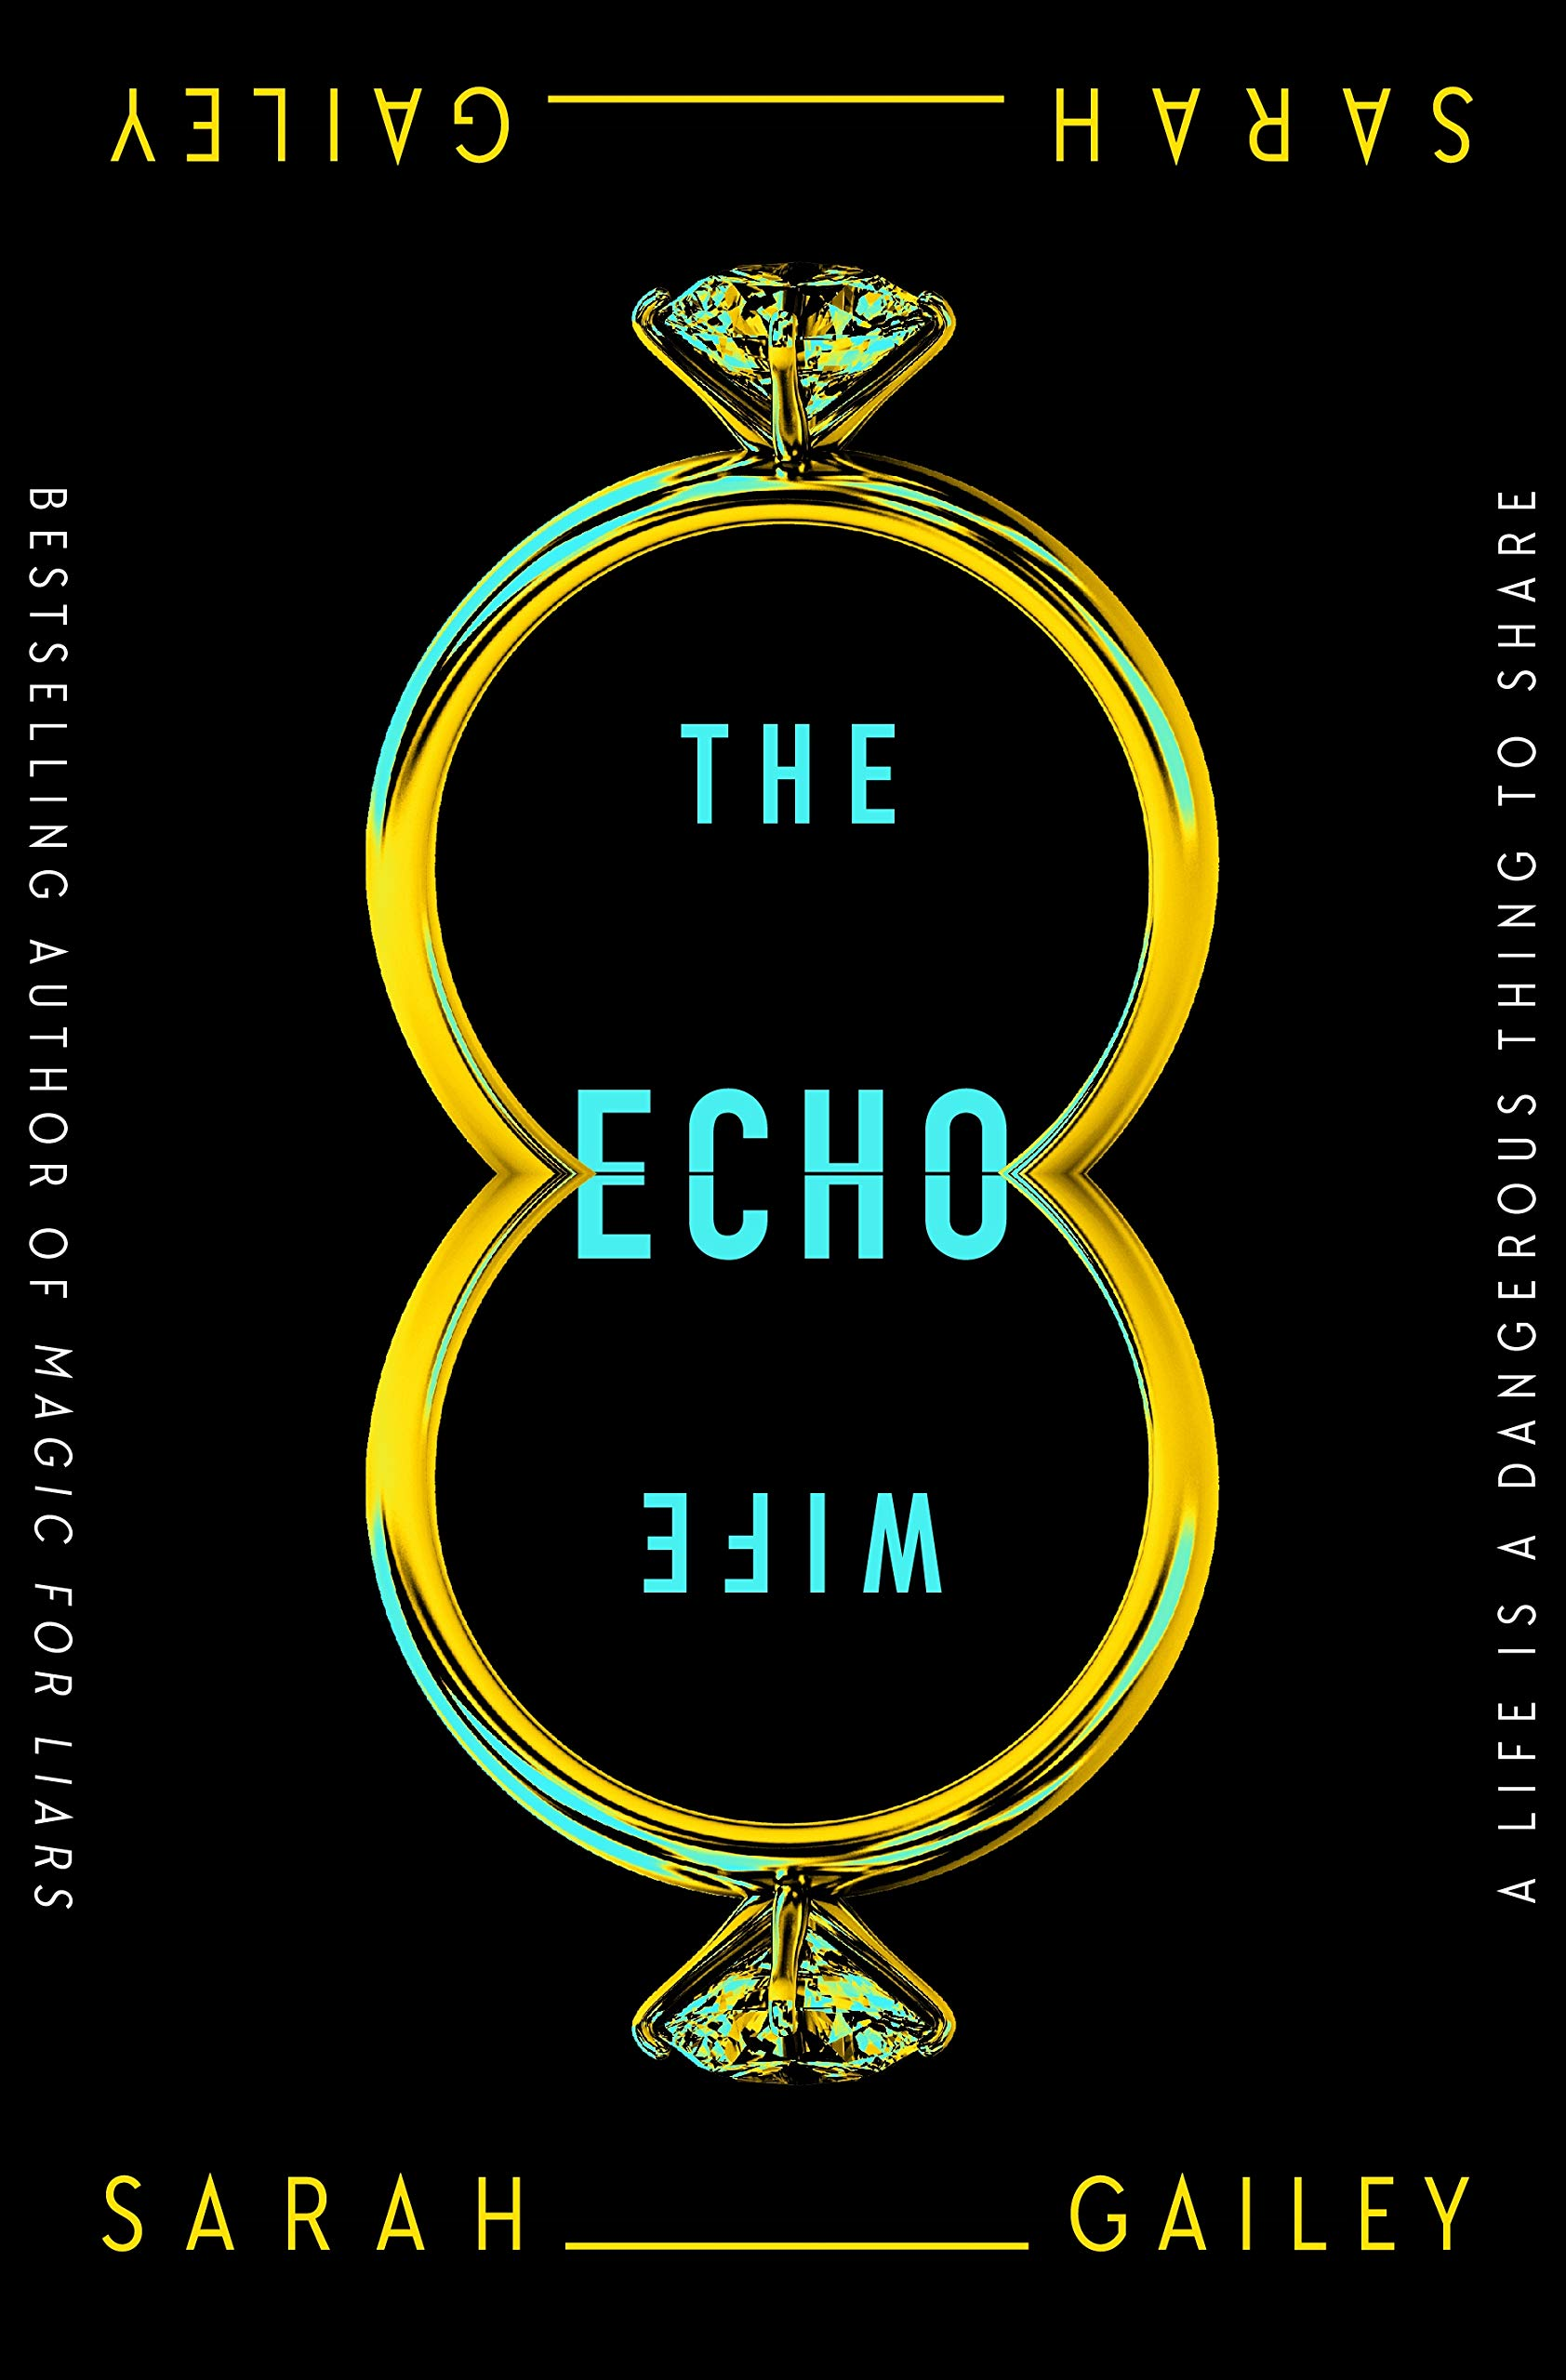 Amazon.com: The Echo Wife (9781250174666): Gailey, Sarah: Books